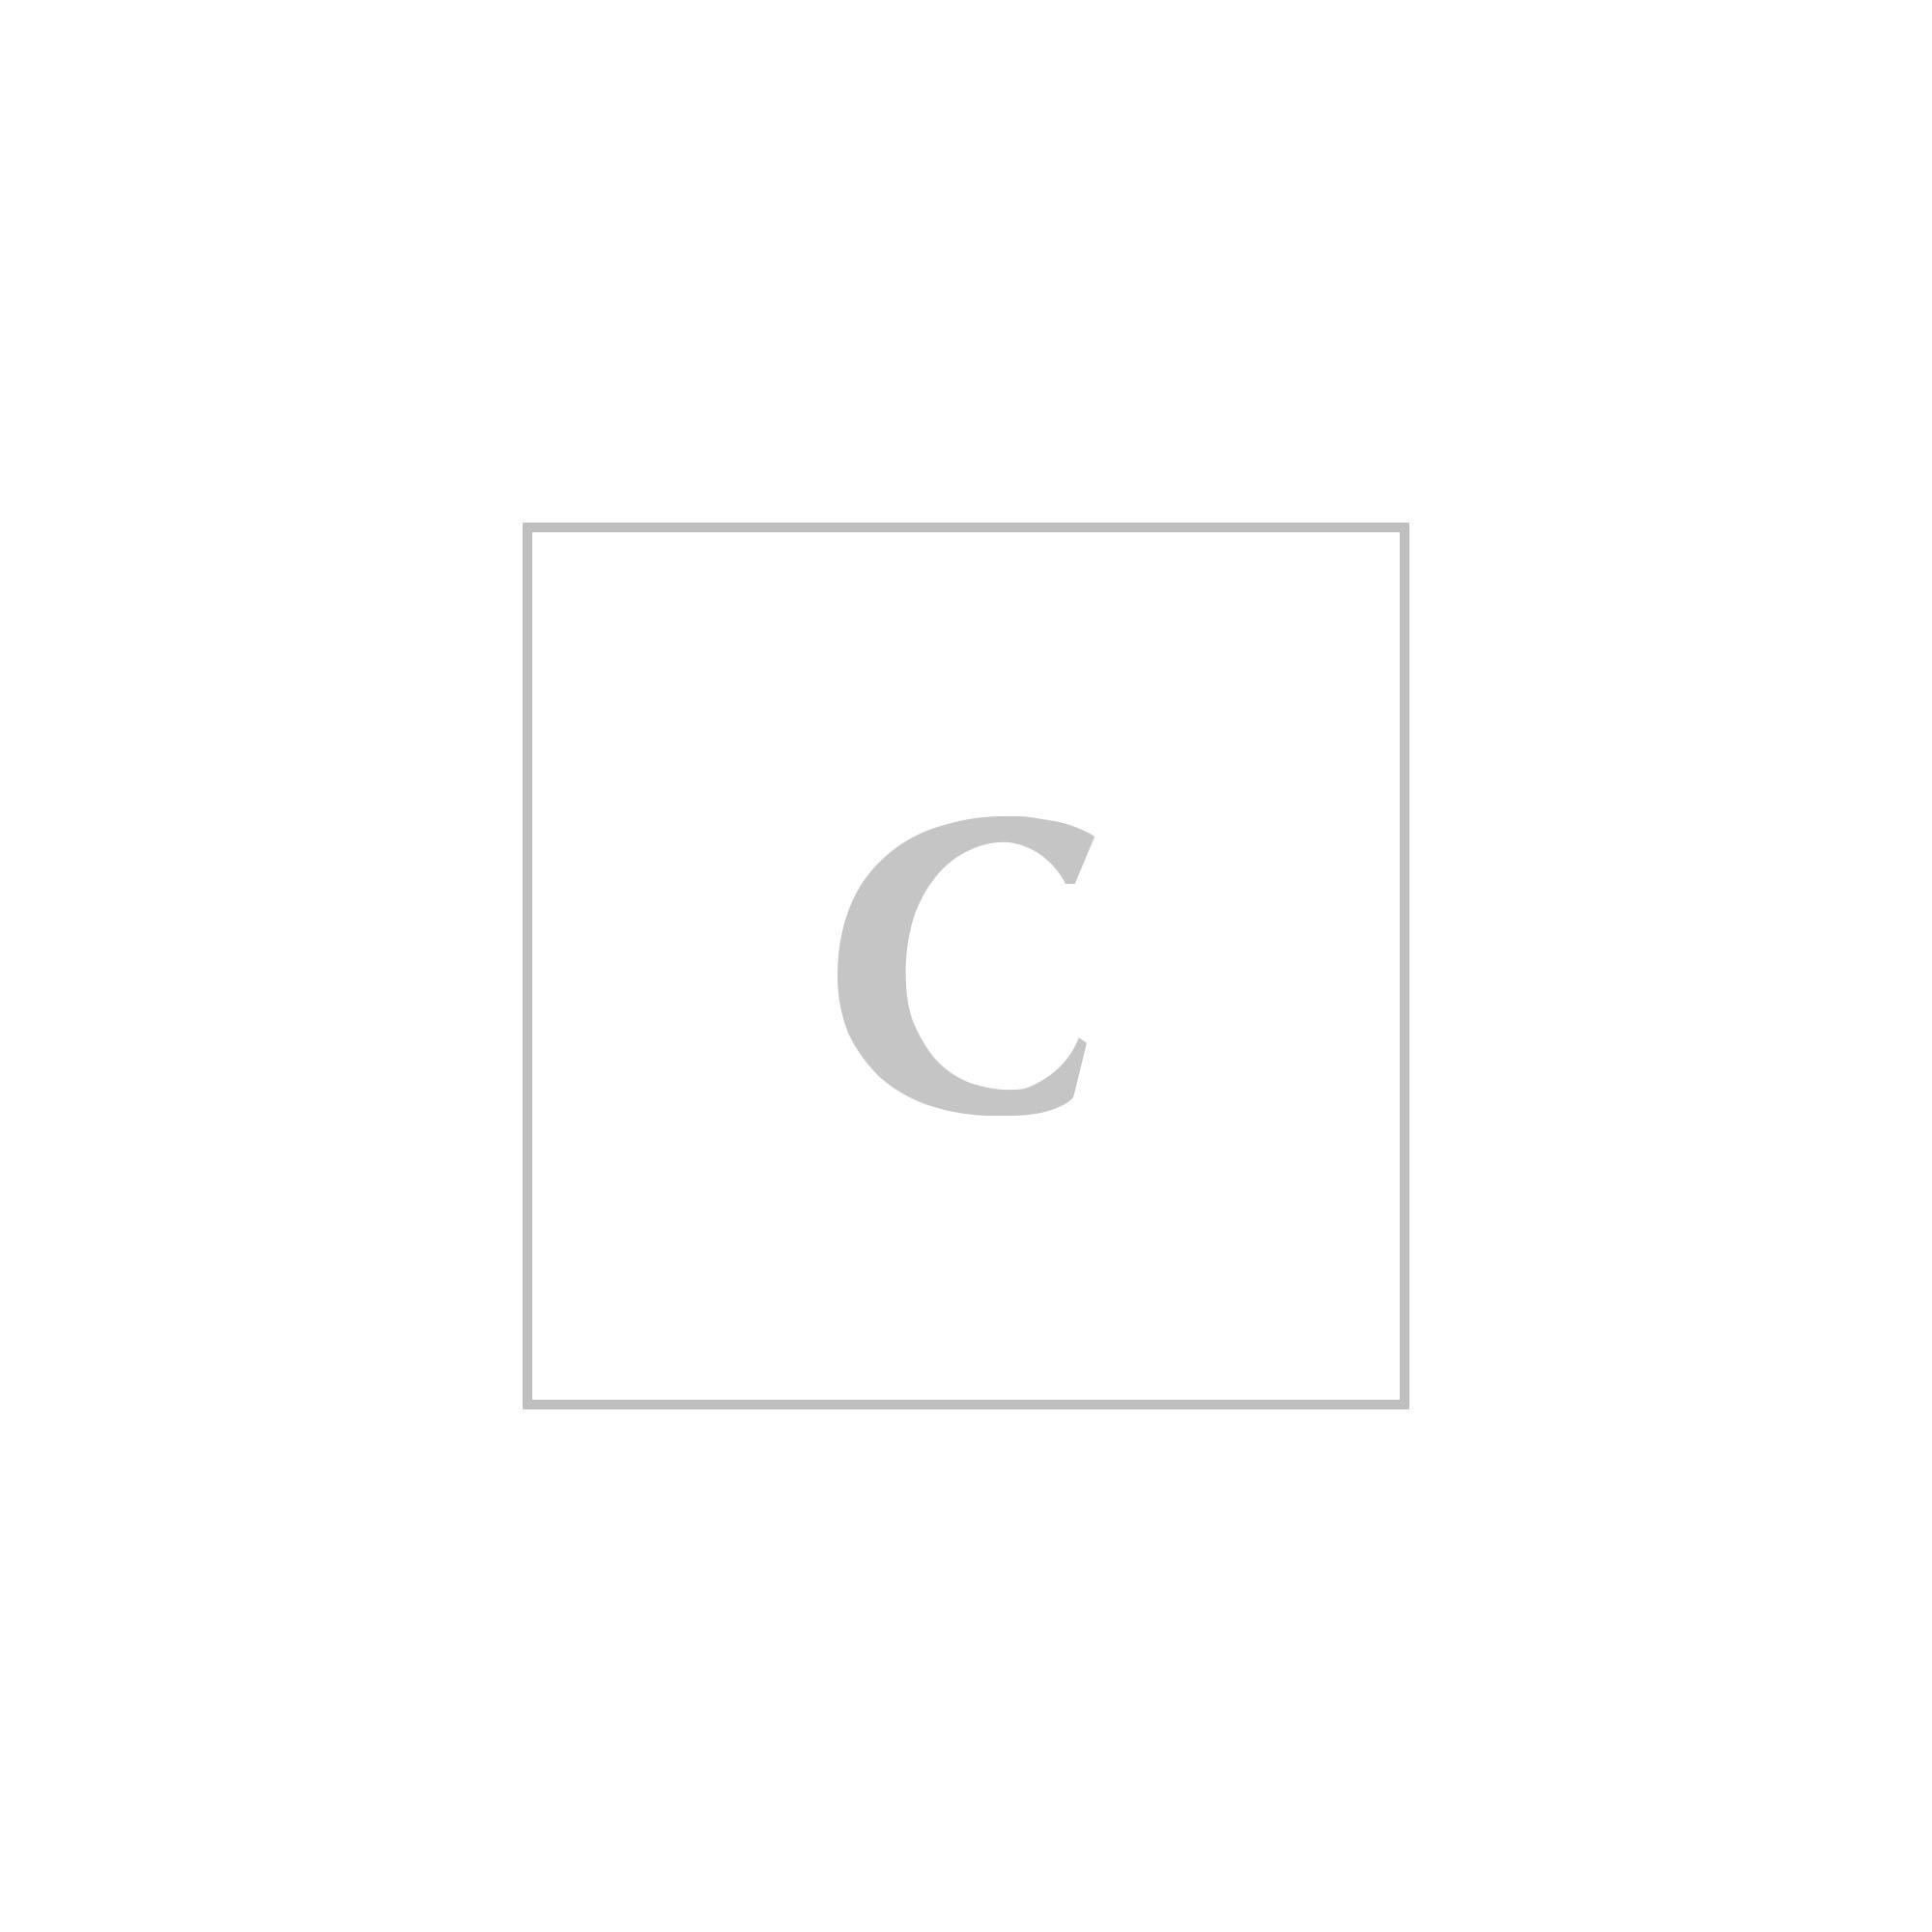 Saint laurent ysl borsa valigia monogram